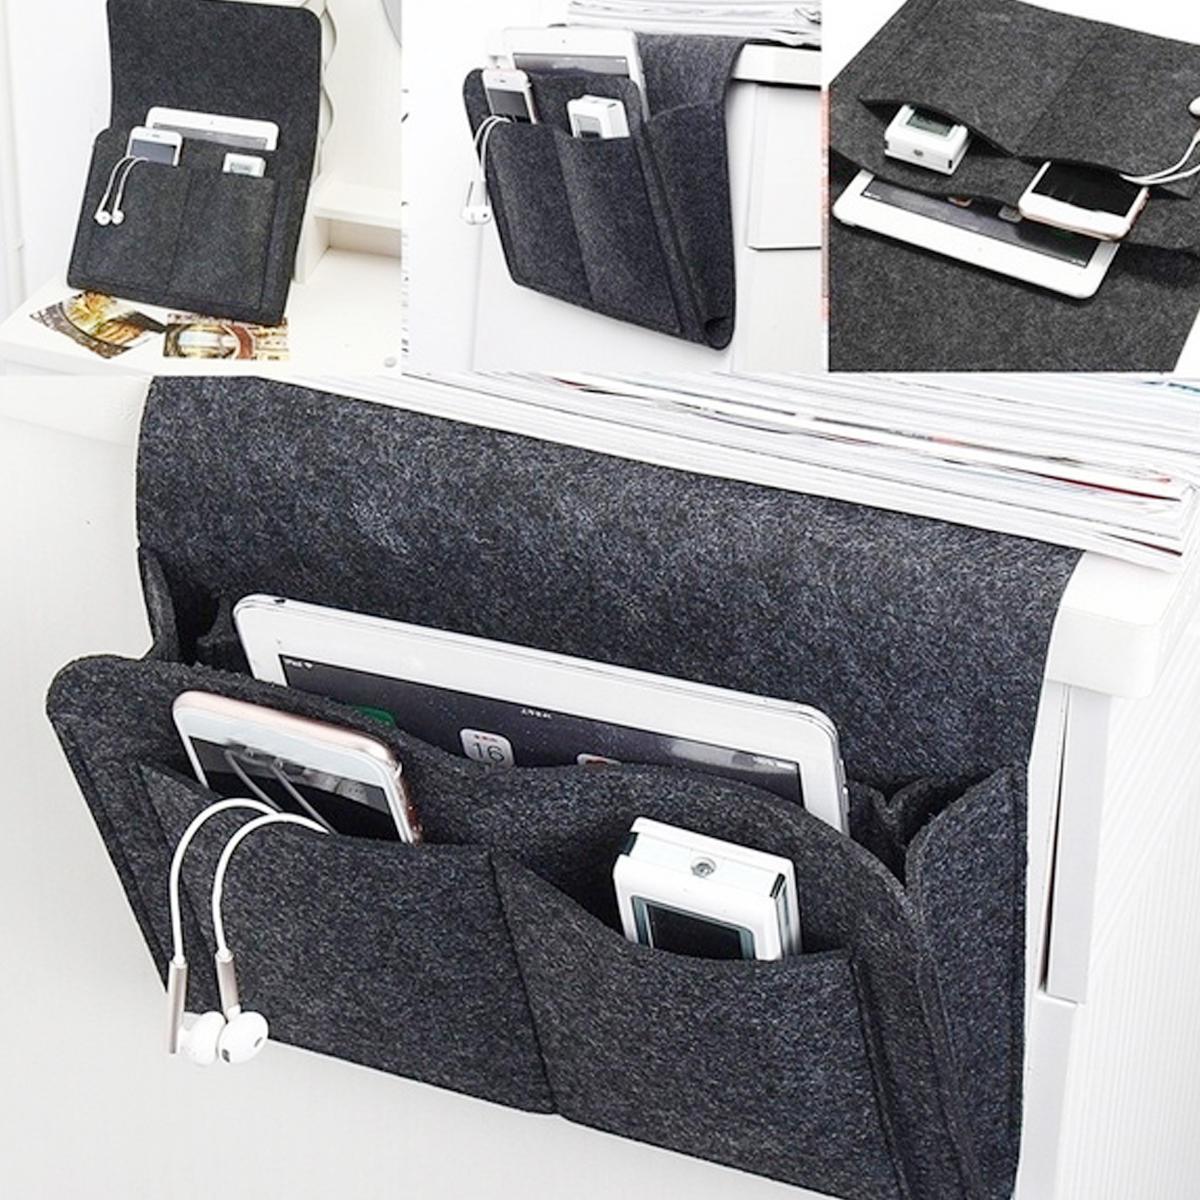 Sofa Storage Bag Remote Book Phone